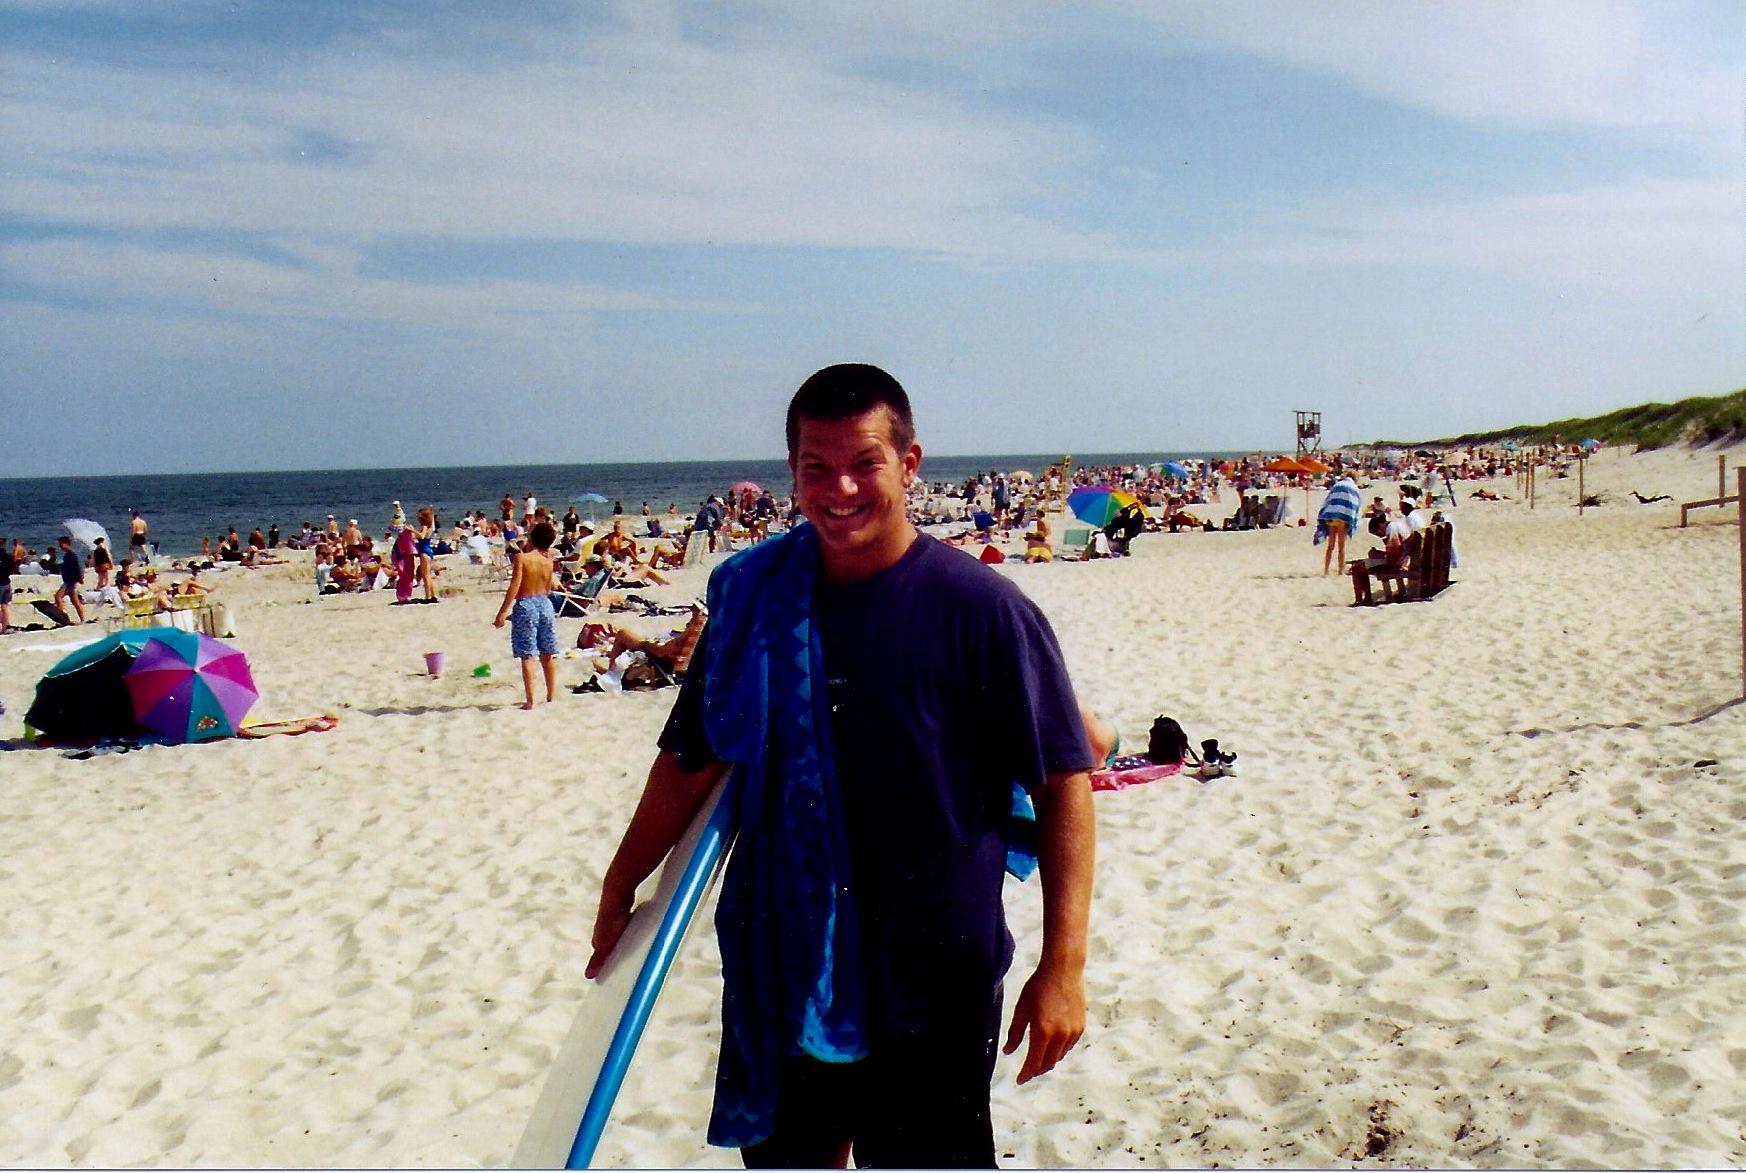 East Coast vacation - Virginia Beach (no waves)